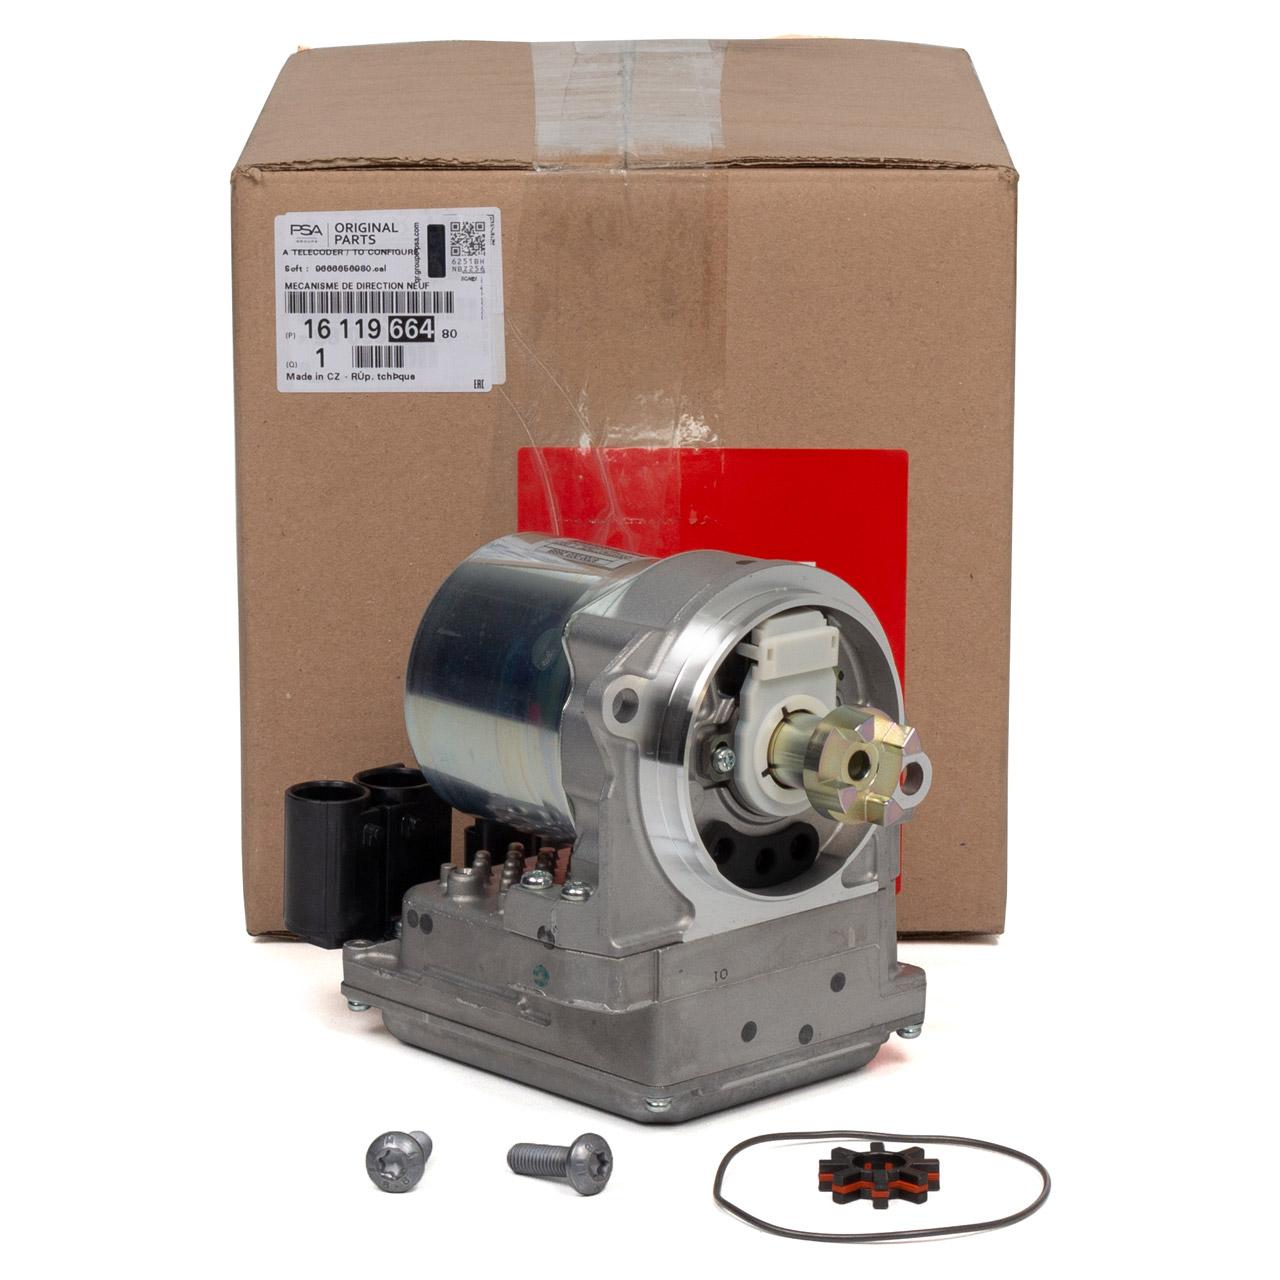 ORIGINAL Citroen Elektromotor für Servolenkung C3 Picasso (SH_) 1611966480